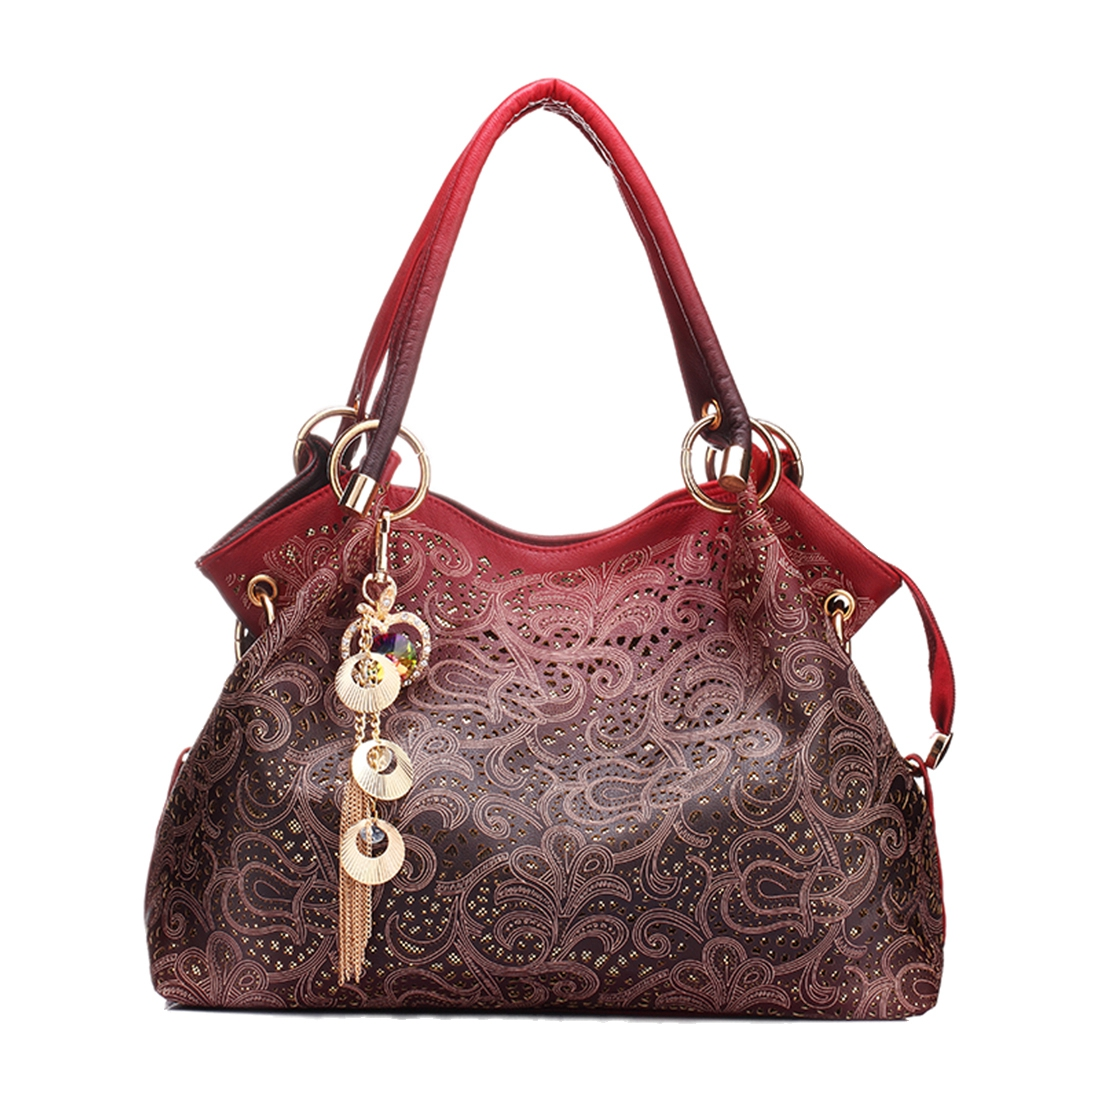 TEXU Women handbag ls